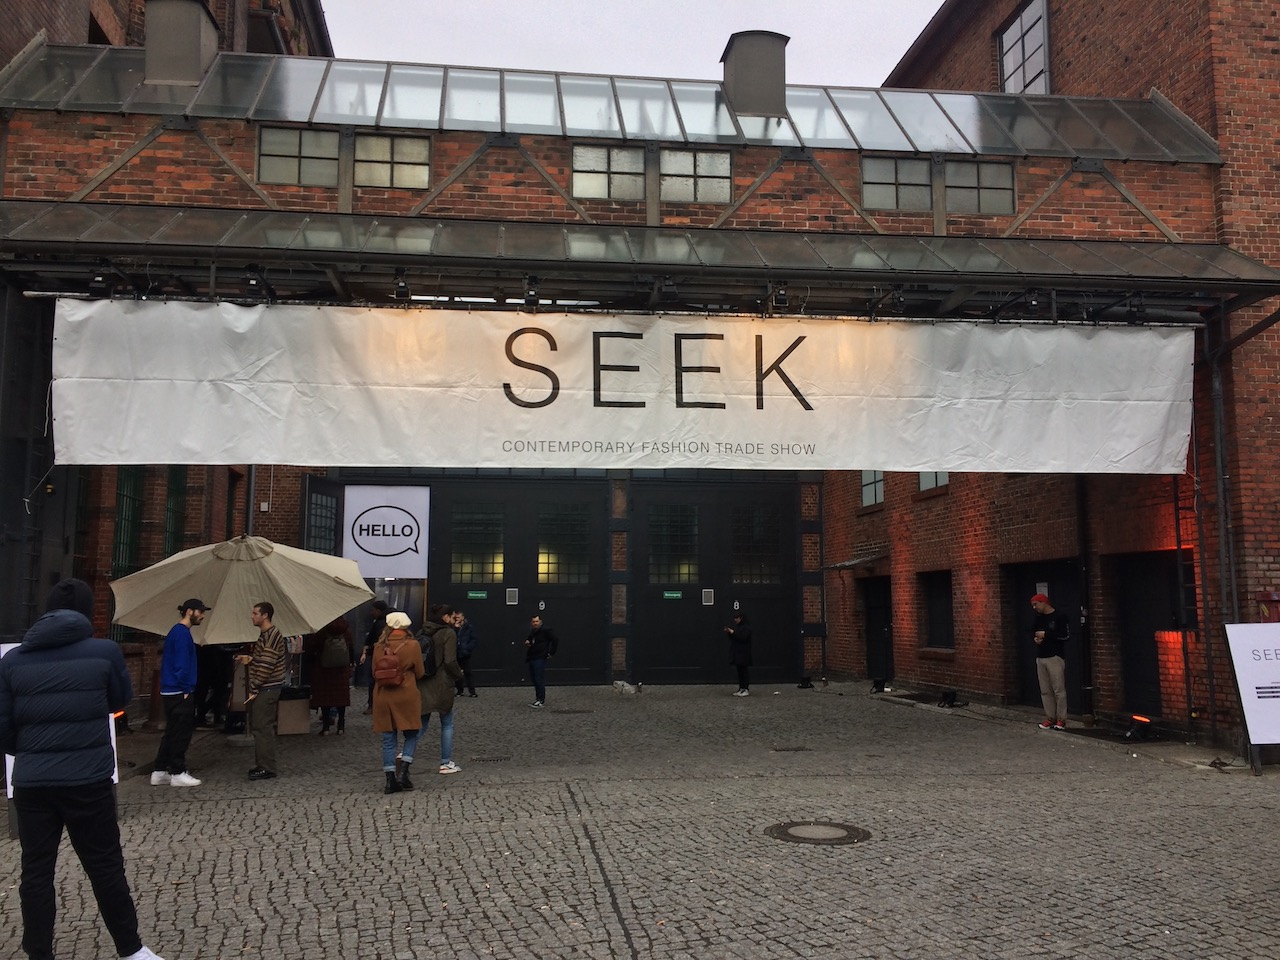 1 SEEK entrance